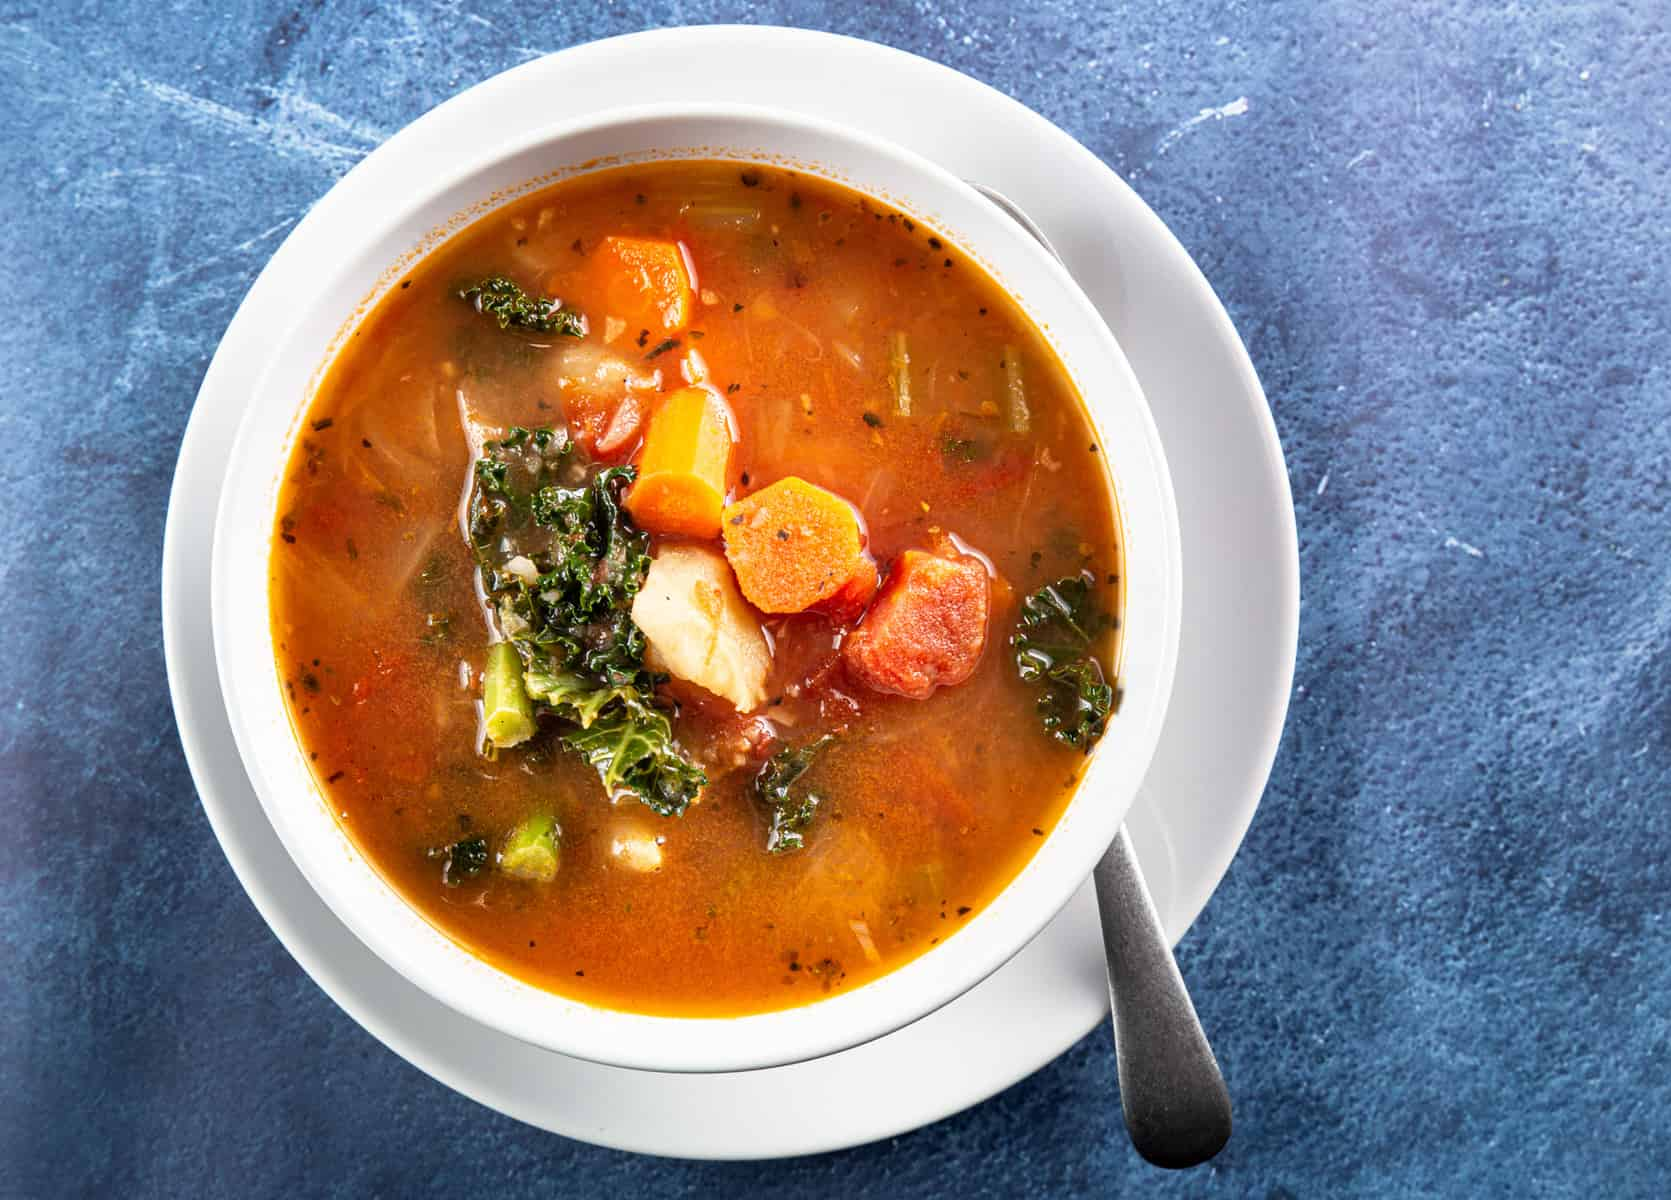 instant pot vegetable soup | vegetable soup instant pot | instant pot veggie soup | instant pot vegetarian soup | pressure cooker vegetable soup